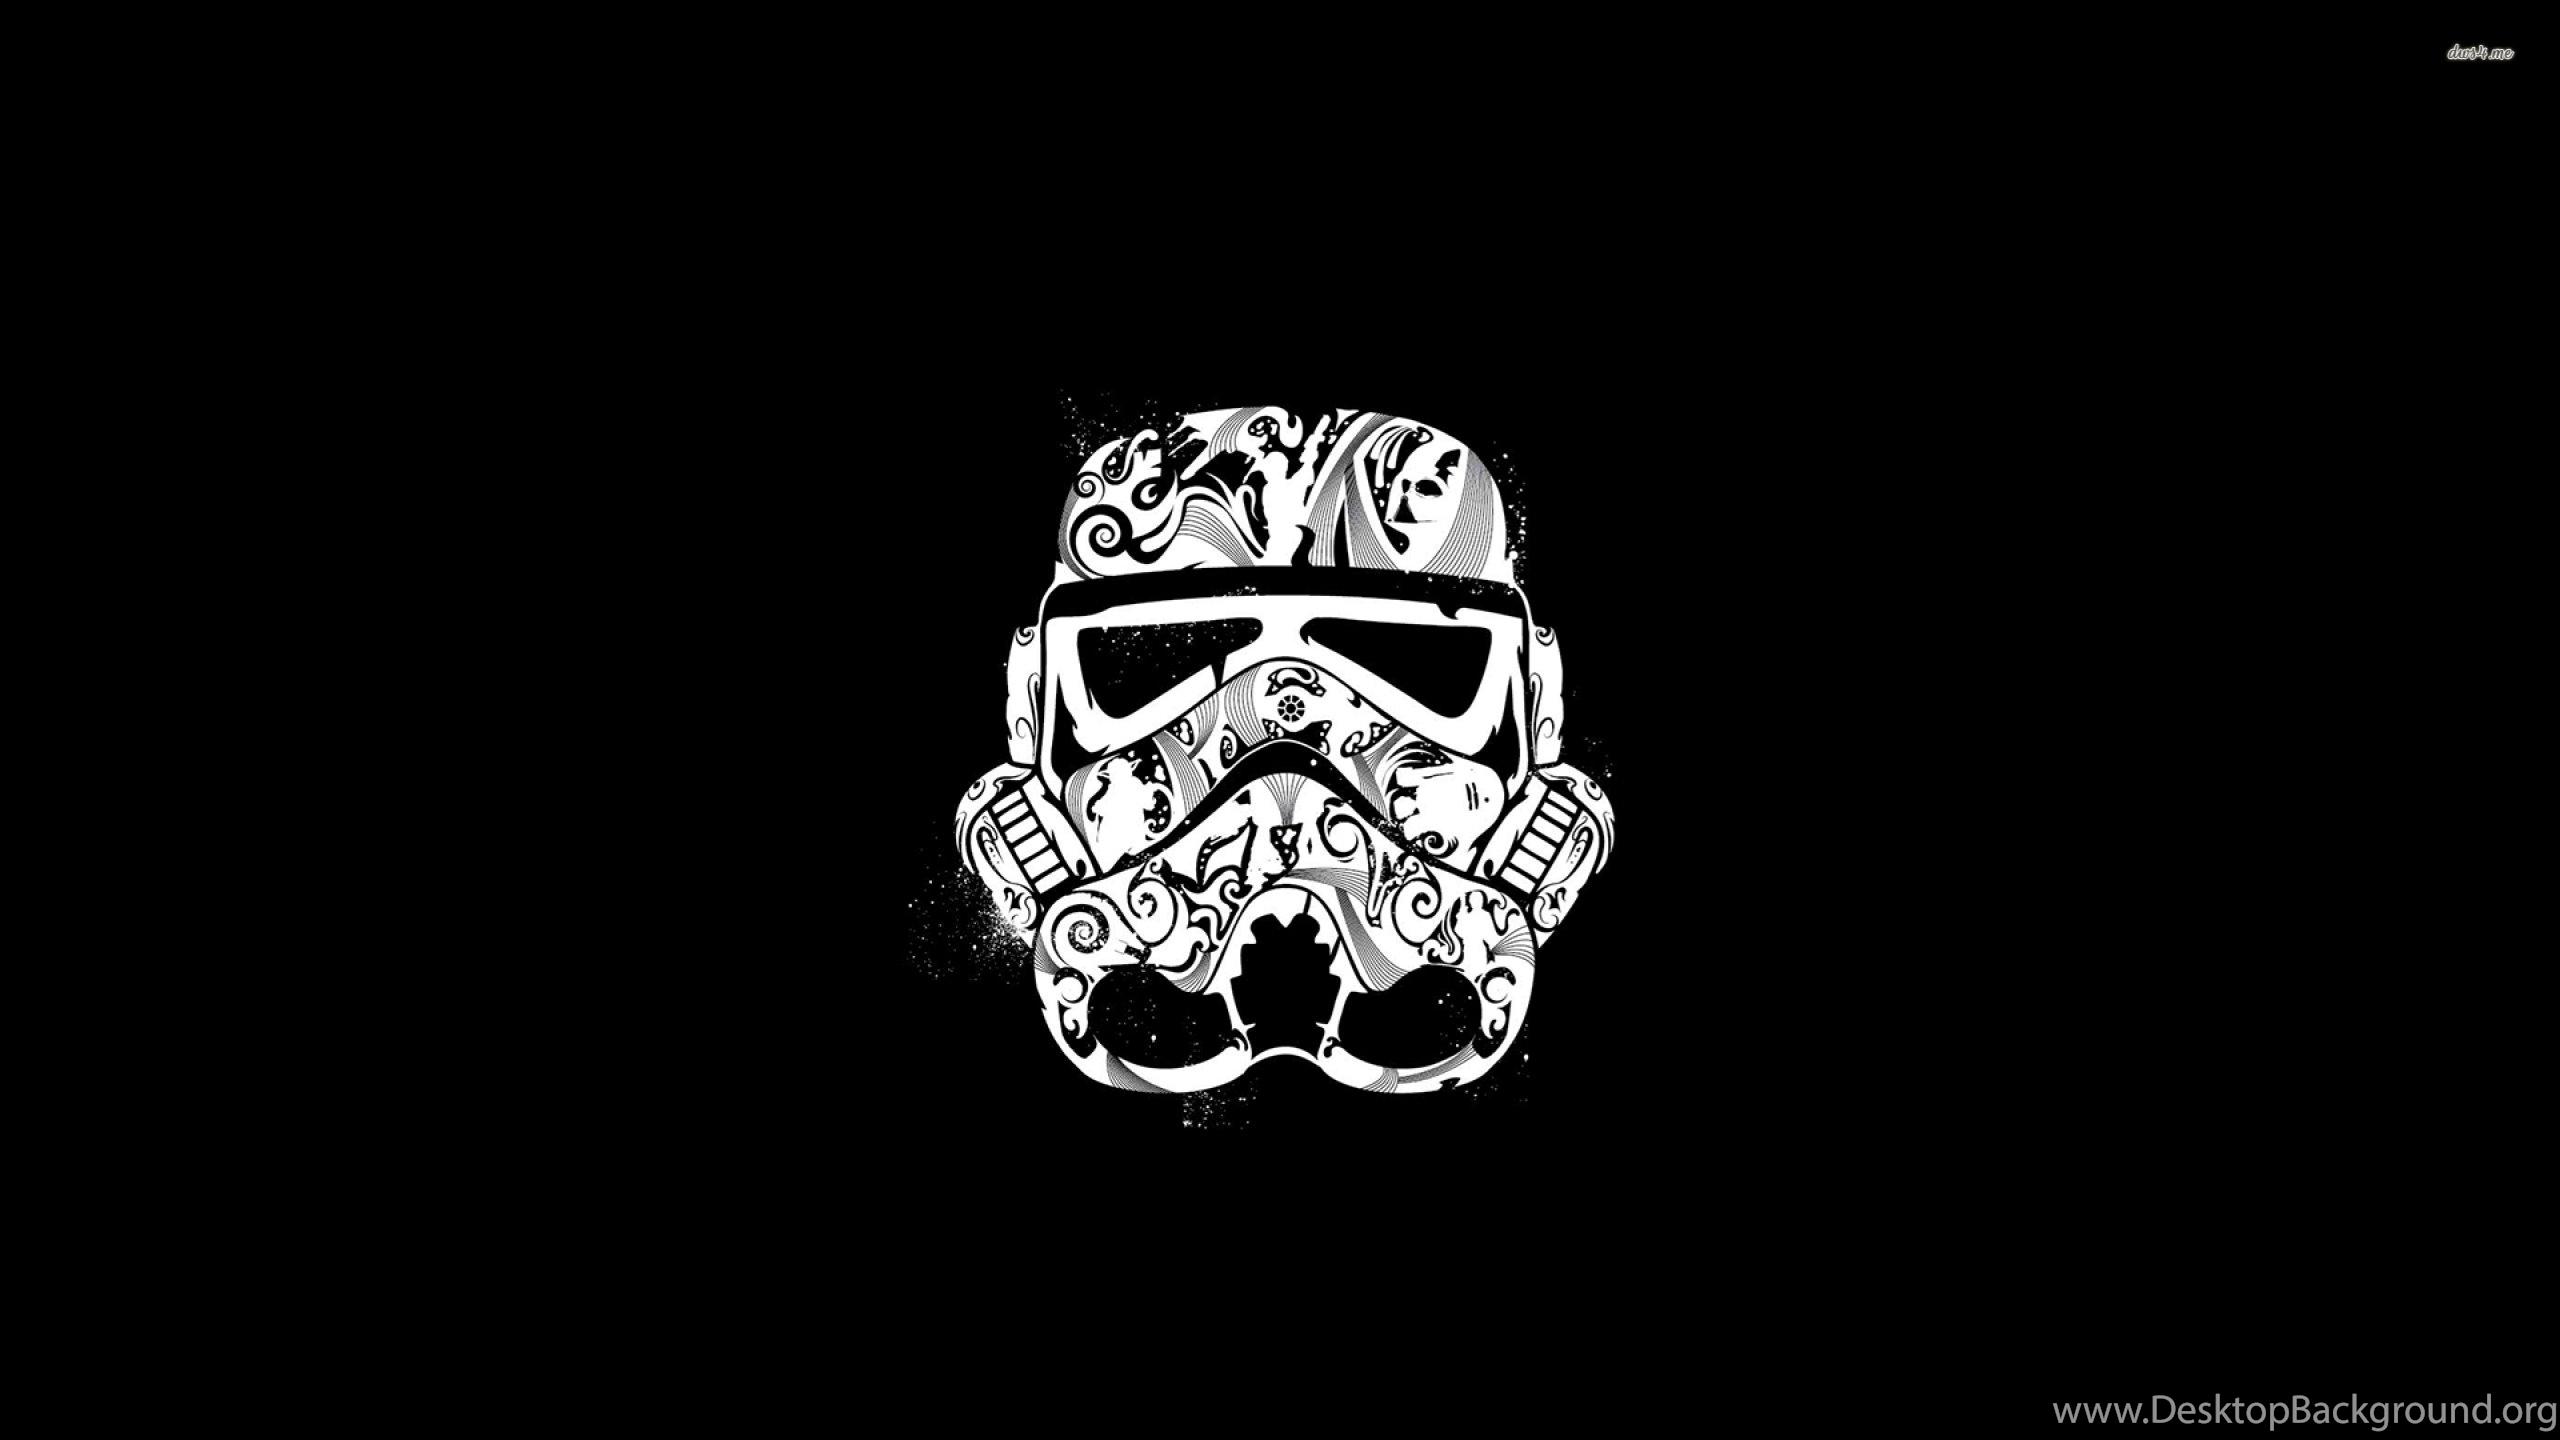 Hd Star Wars Wallpapers Desktop Background